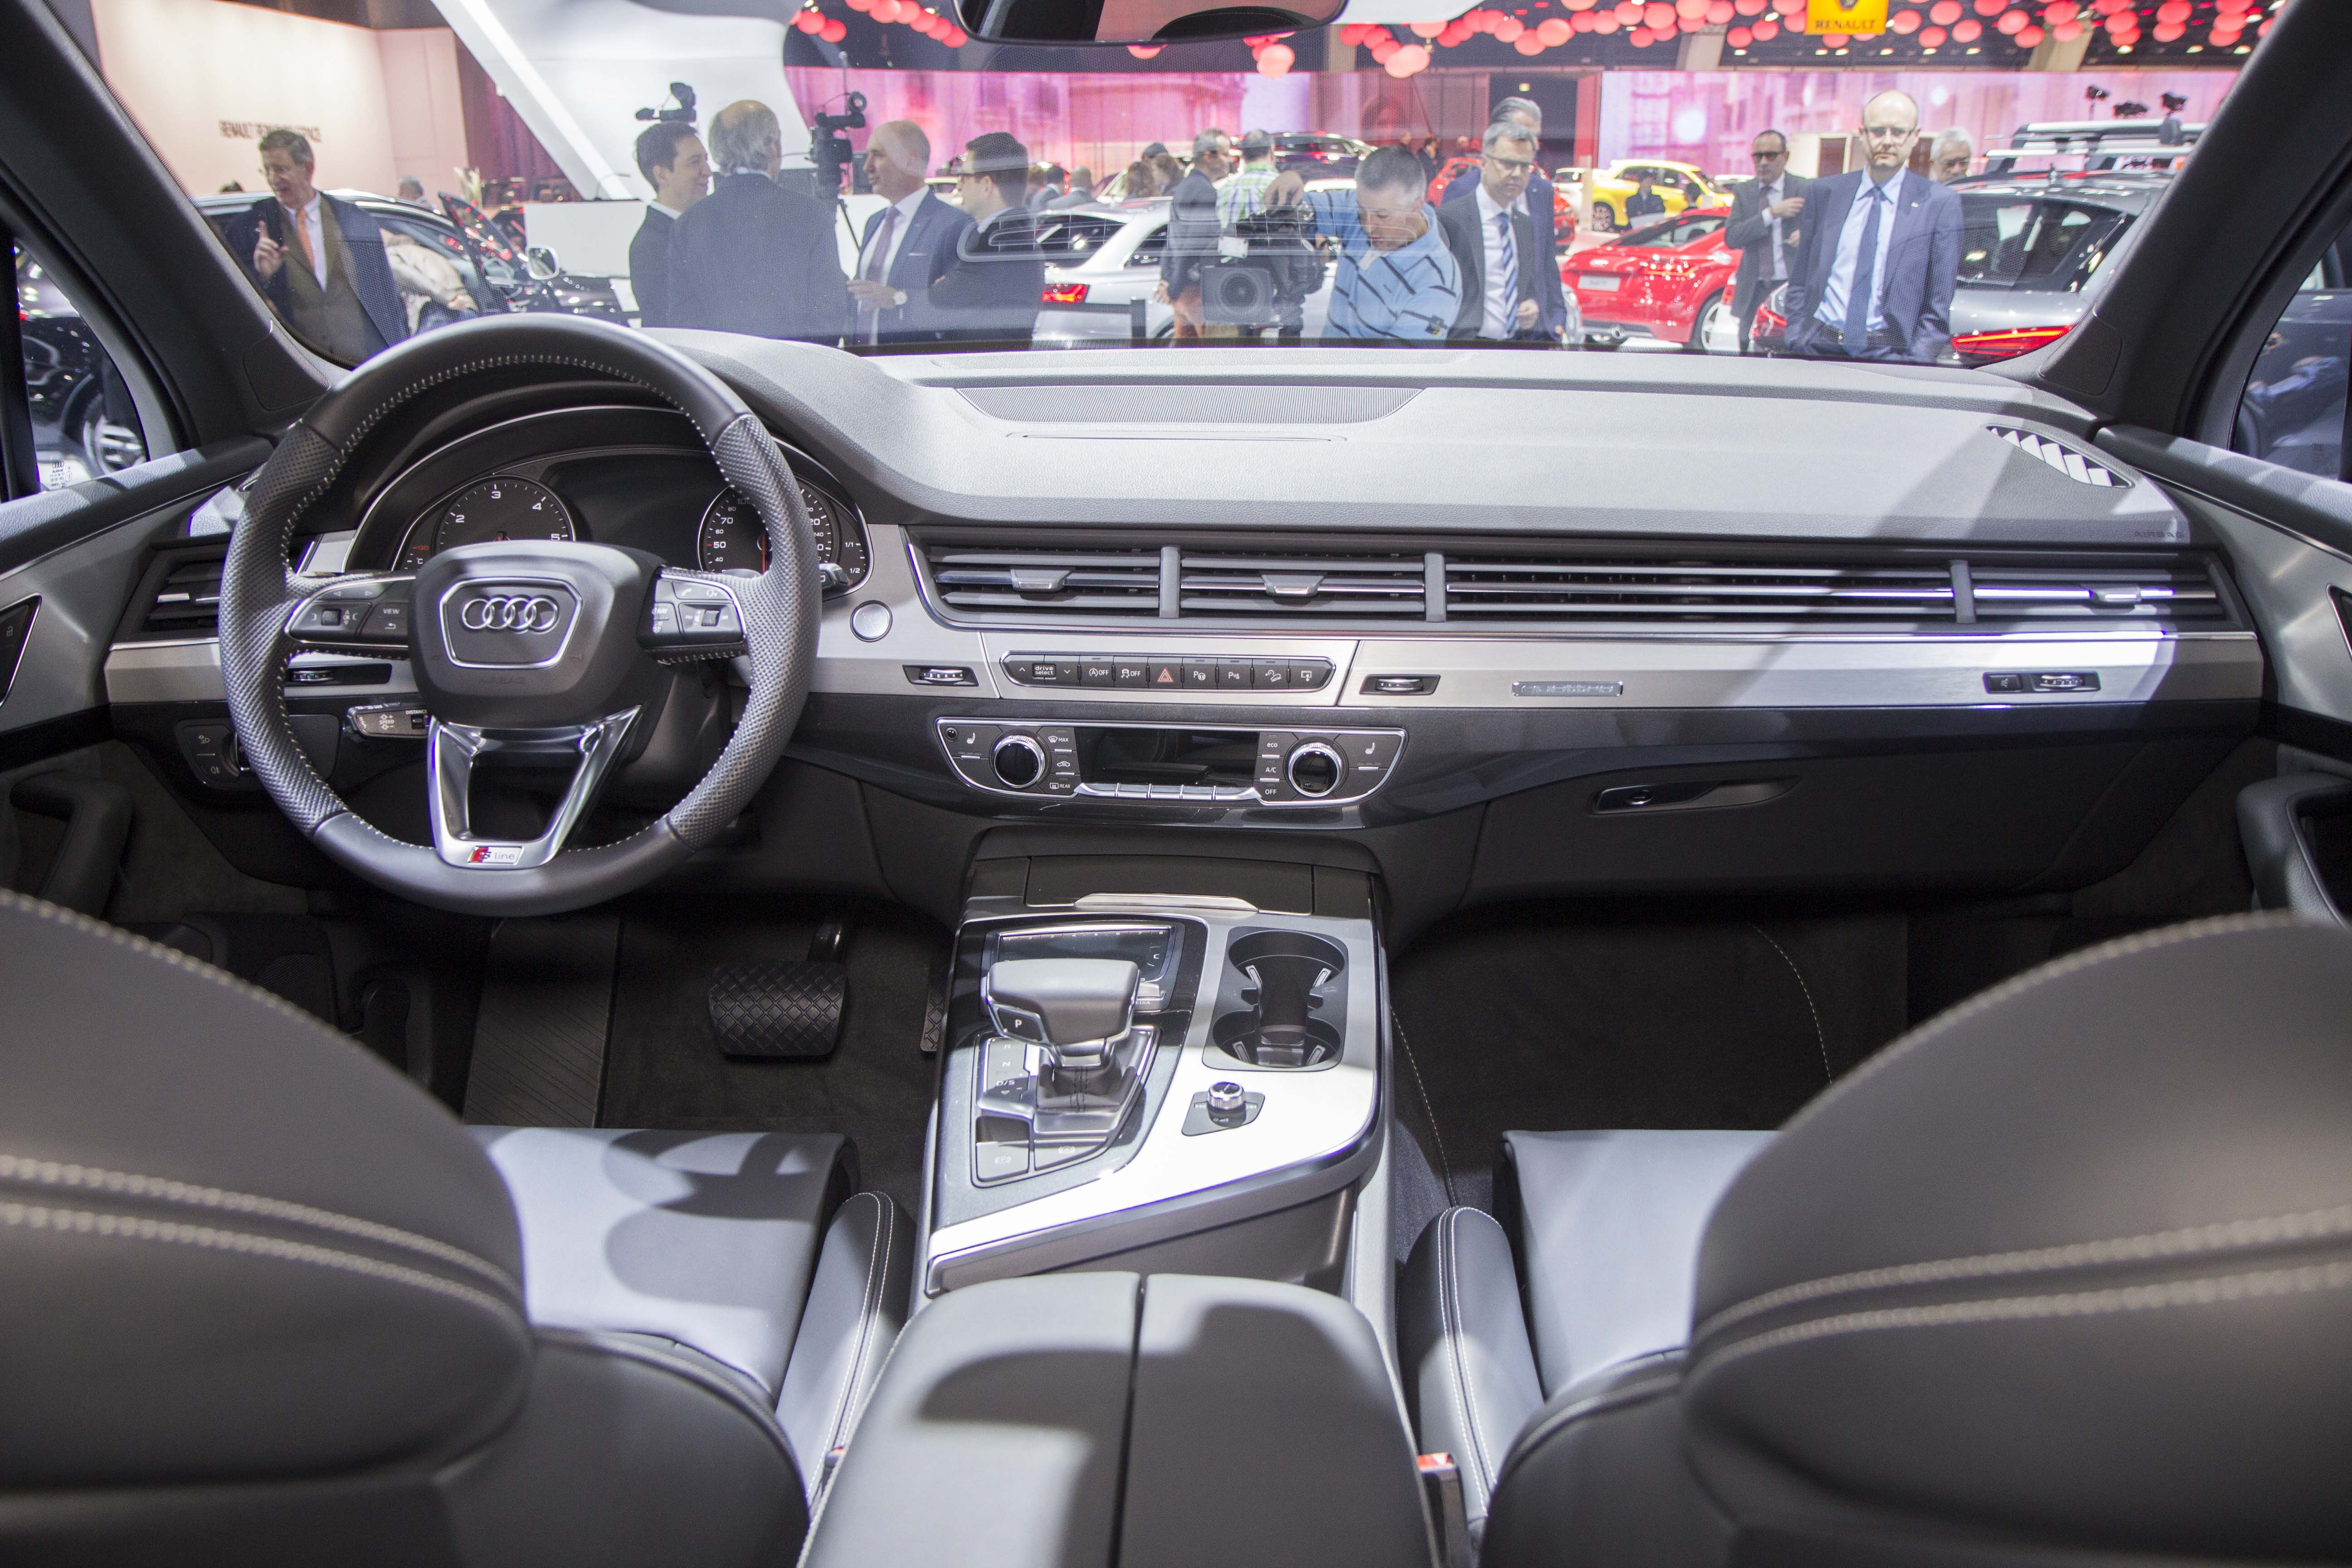 https://images.caradisiac.com/images/0/1/4/9/100149/S0-En-direct-du-salon-de-Bruxelles-Audi-Q7-la-revolution-342610.jpg